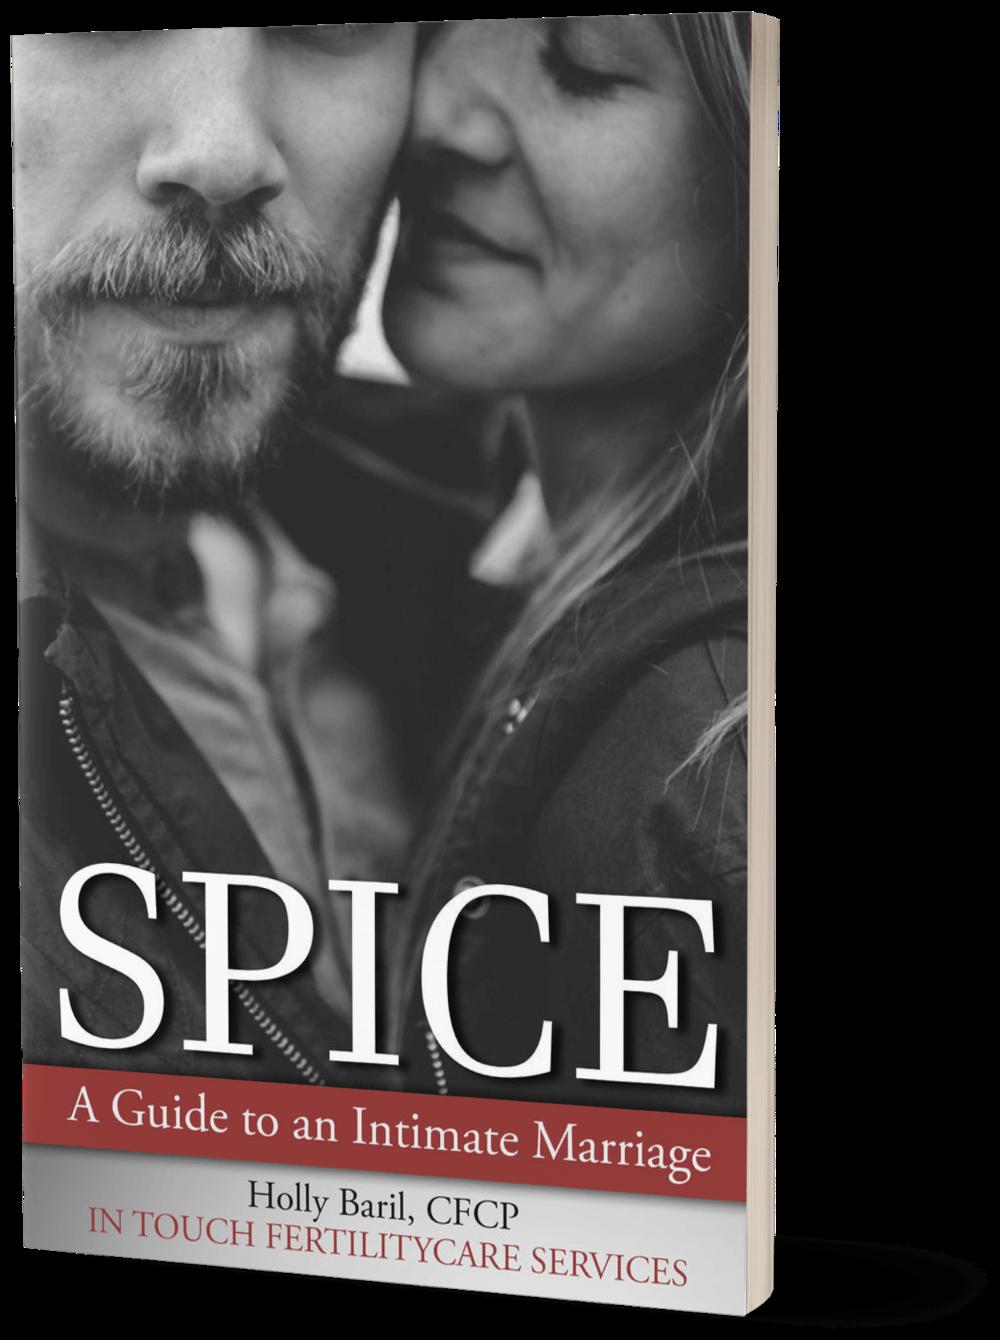 spice-ebook-mockup.png